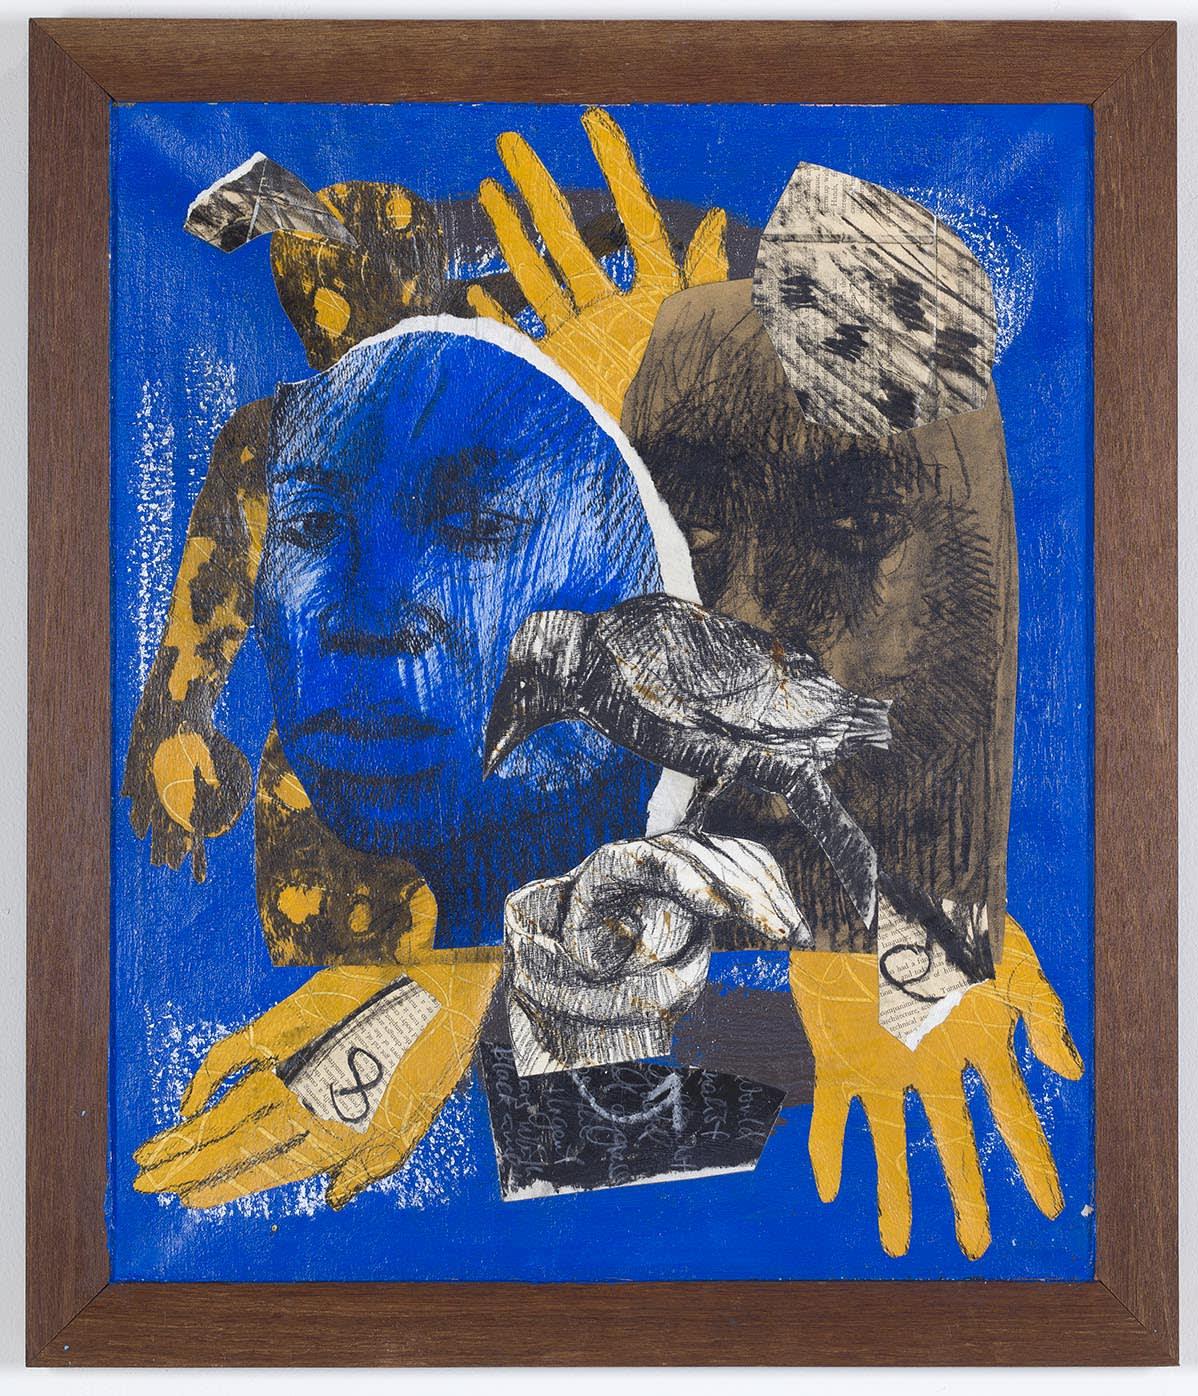 Ronald Muchatuta, Blue face, 2020